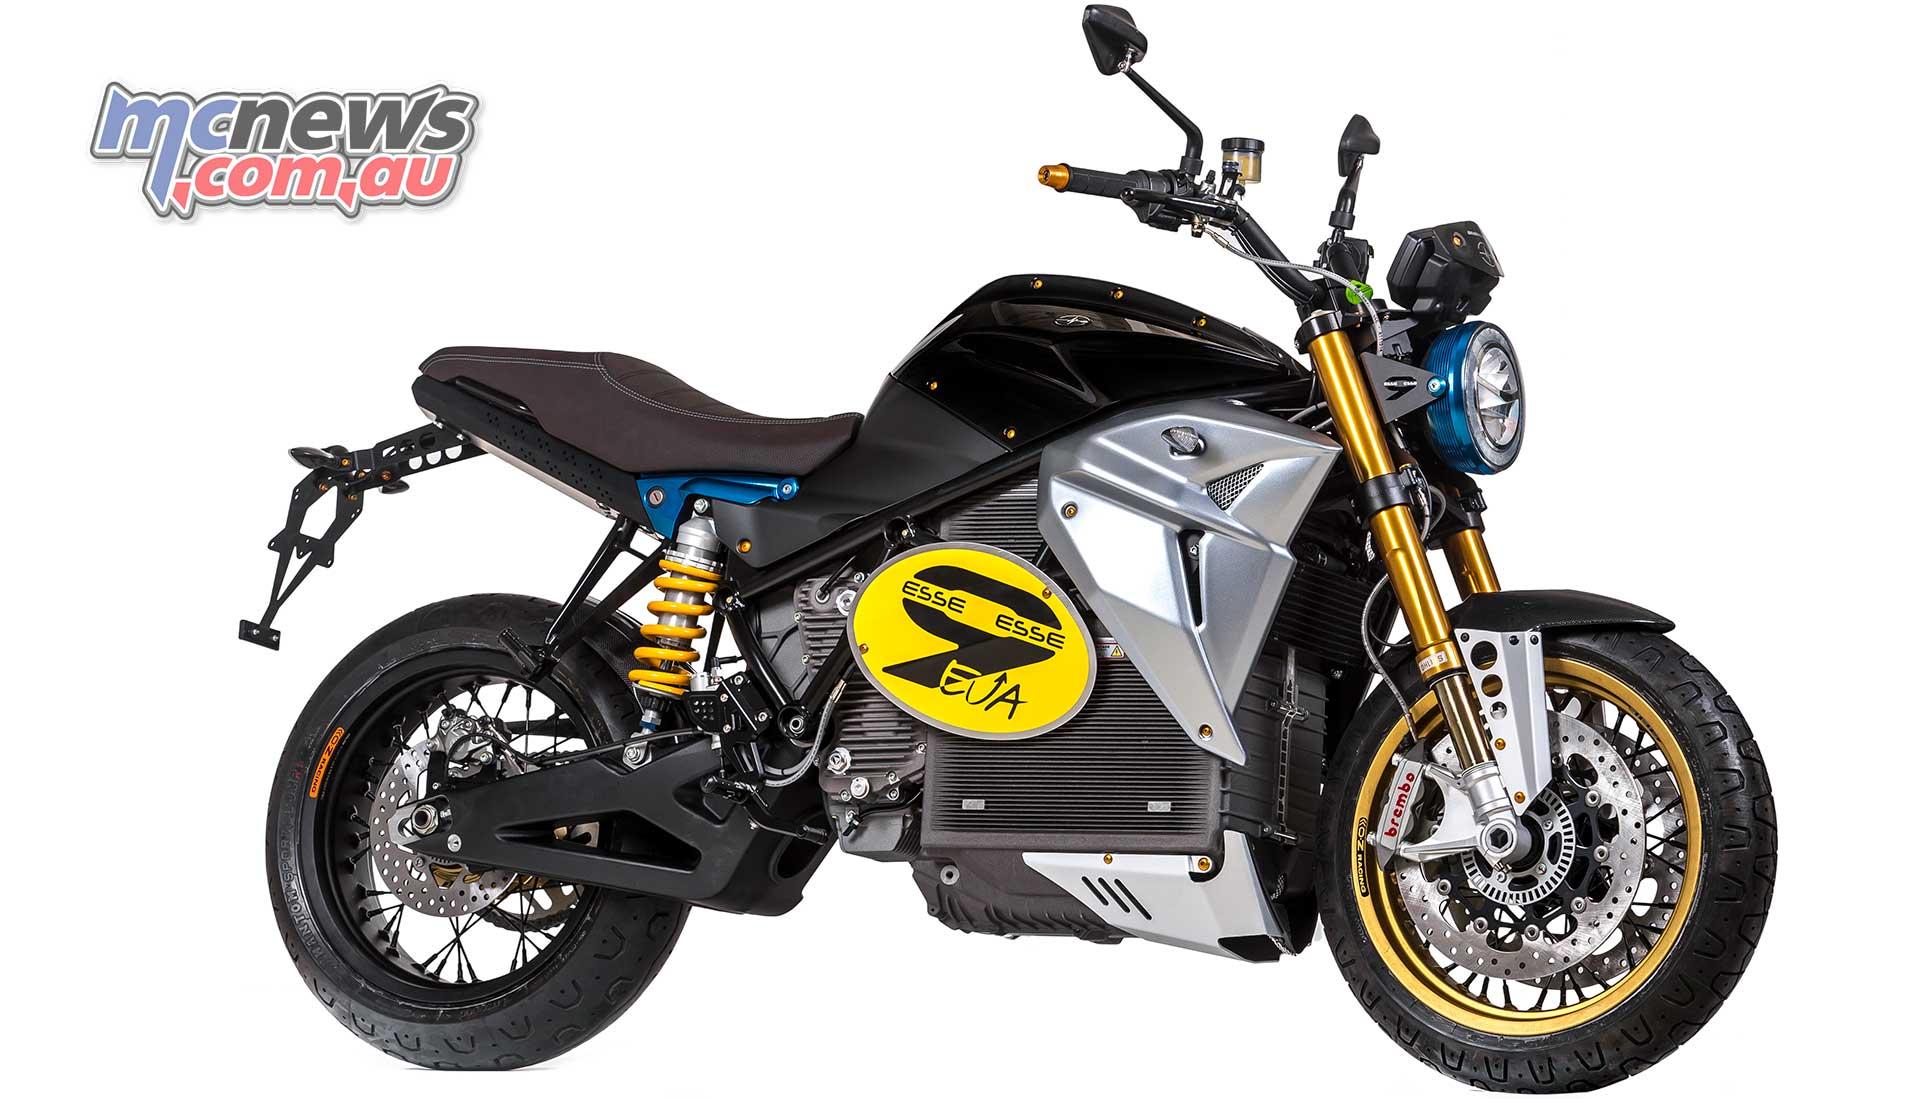 Energica reveal 2019 E-motorcycle range | MCNews.com.au